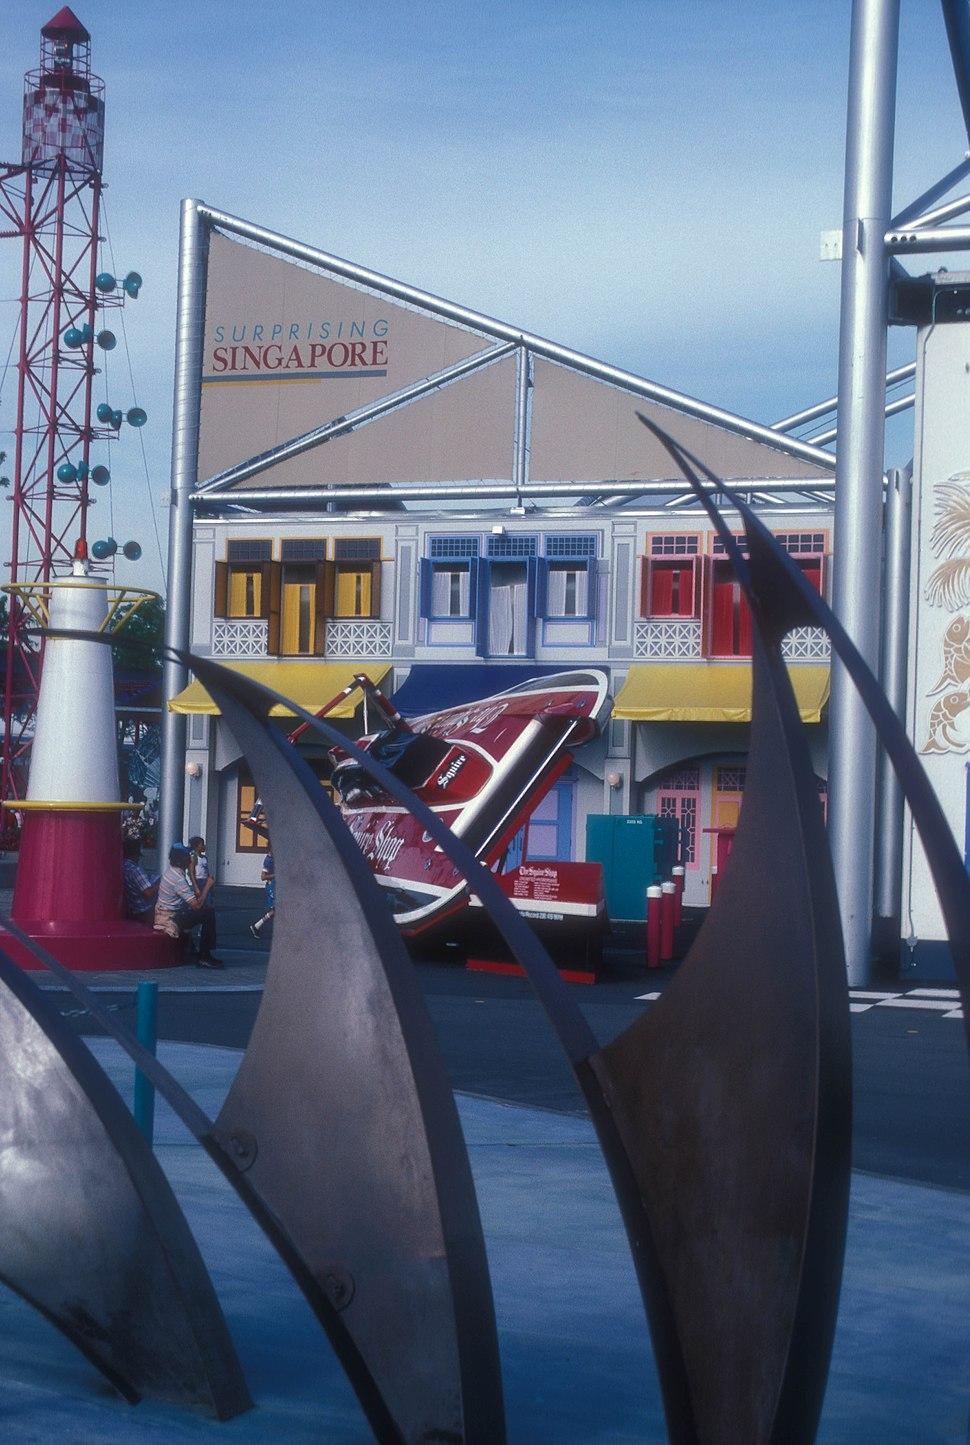 SINGAPORE PAVILION AT EXPO 86, VANCOUVER, B.C.